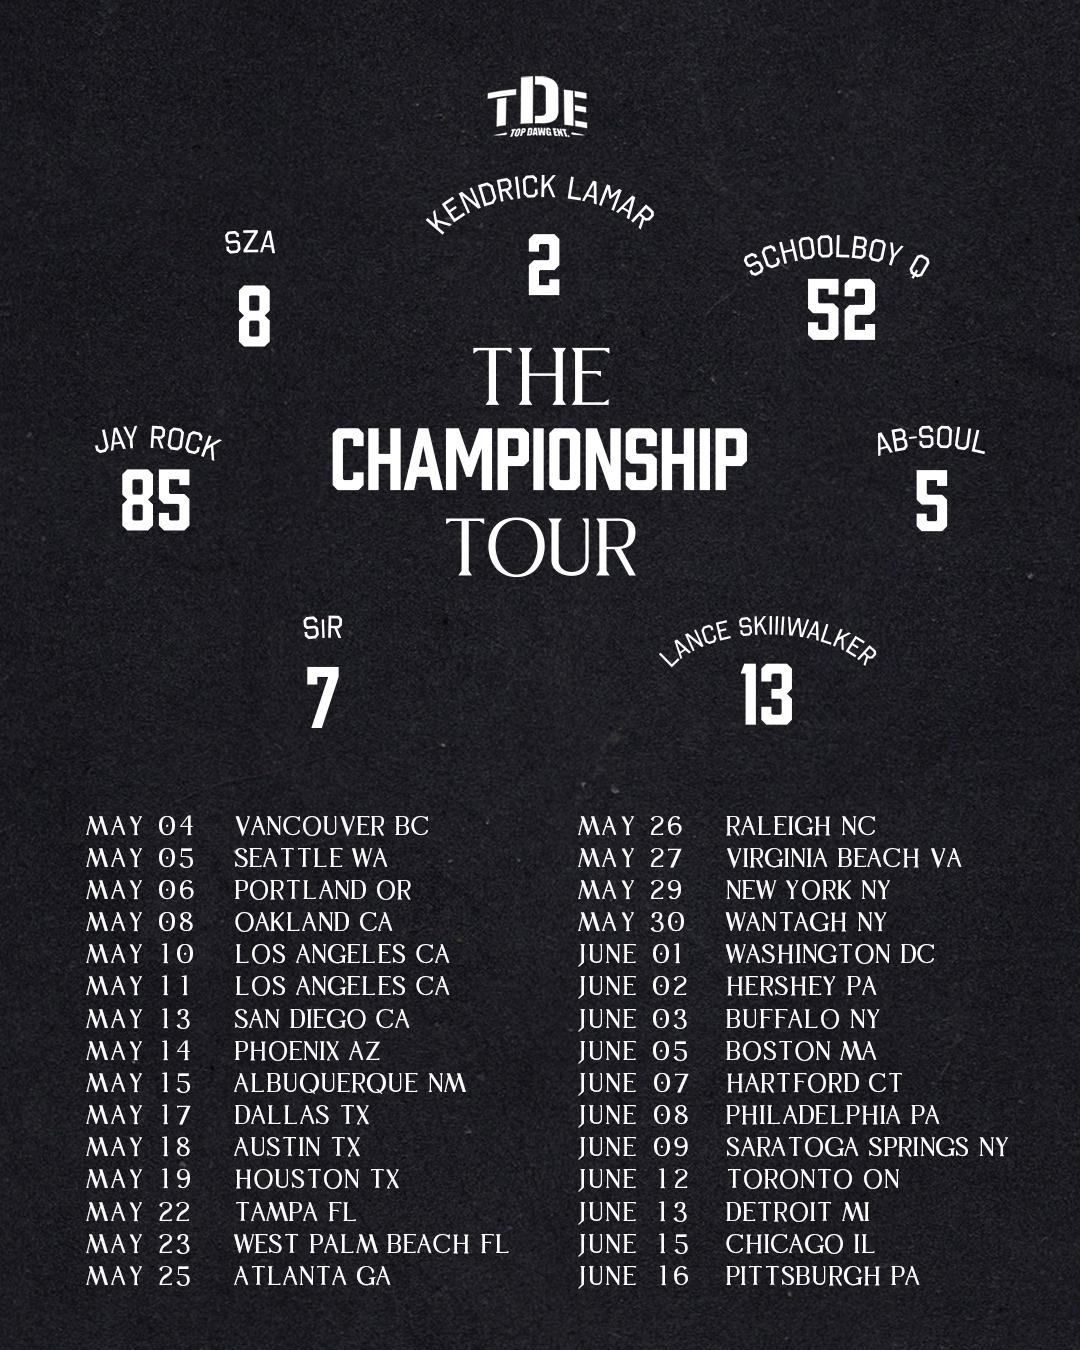 The Championship Tour 2018